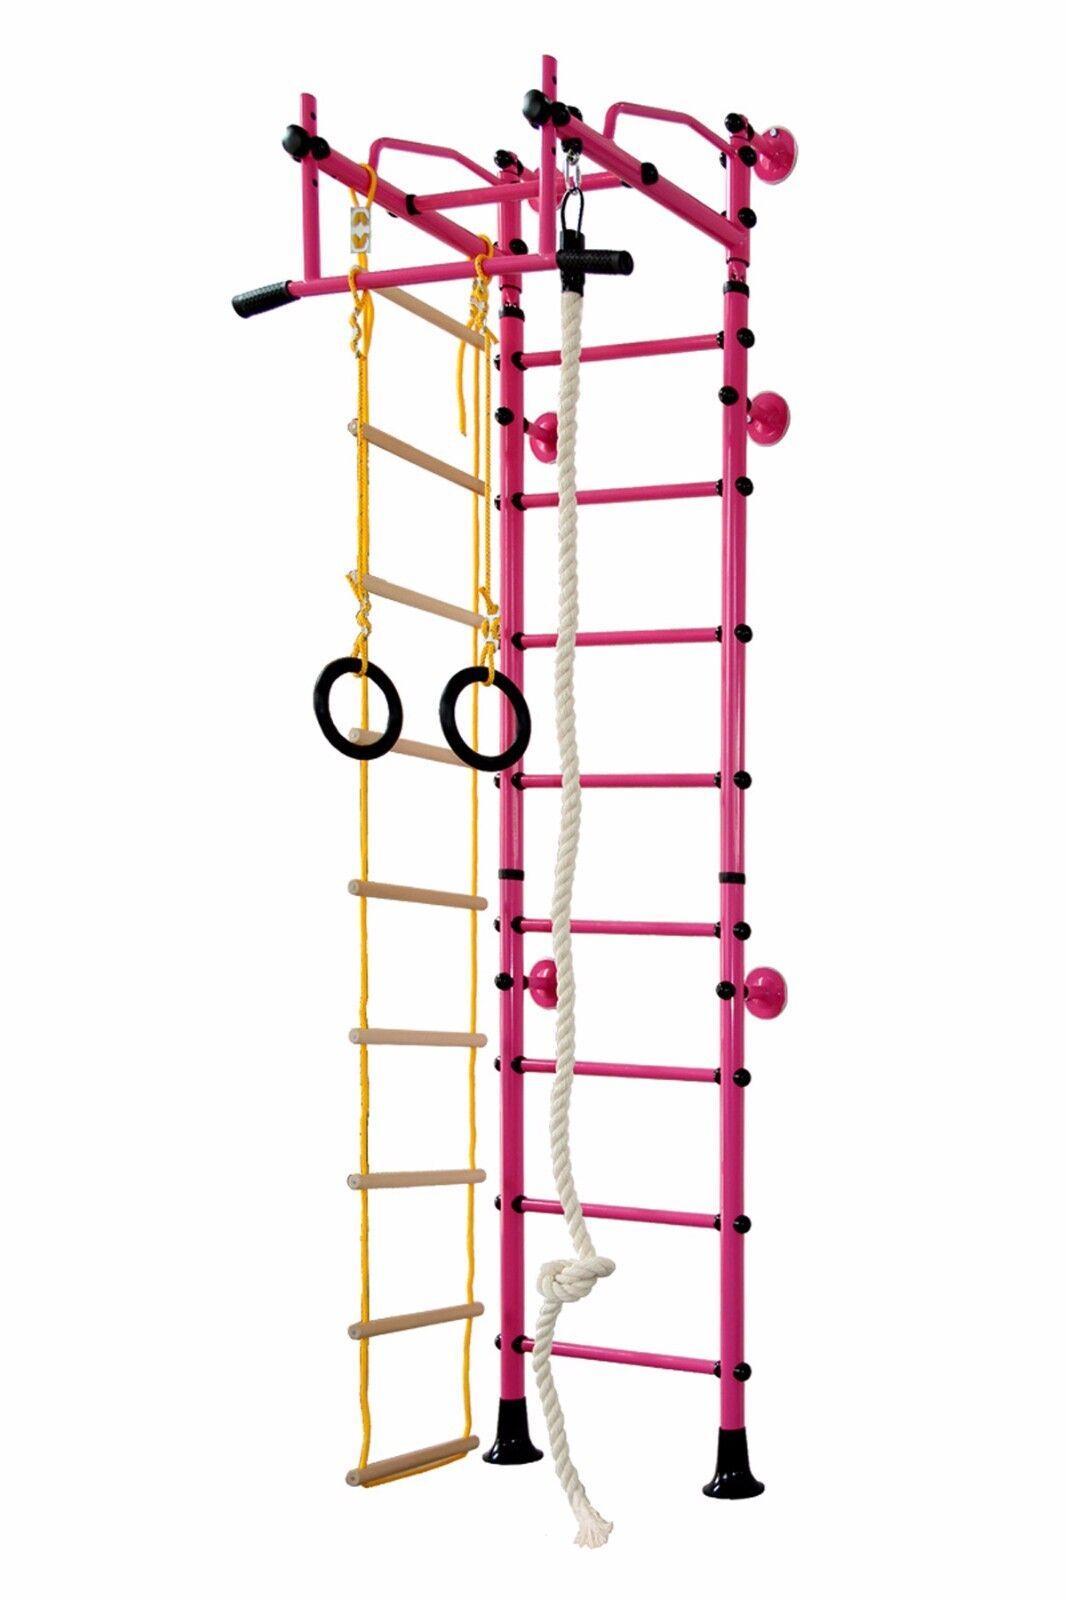 Klettergerüst Sport Kinder Kletterwand Sprossenwand Made in Germany - FitTop M2